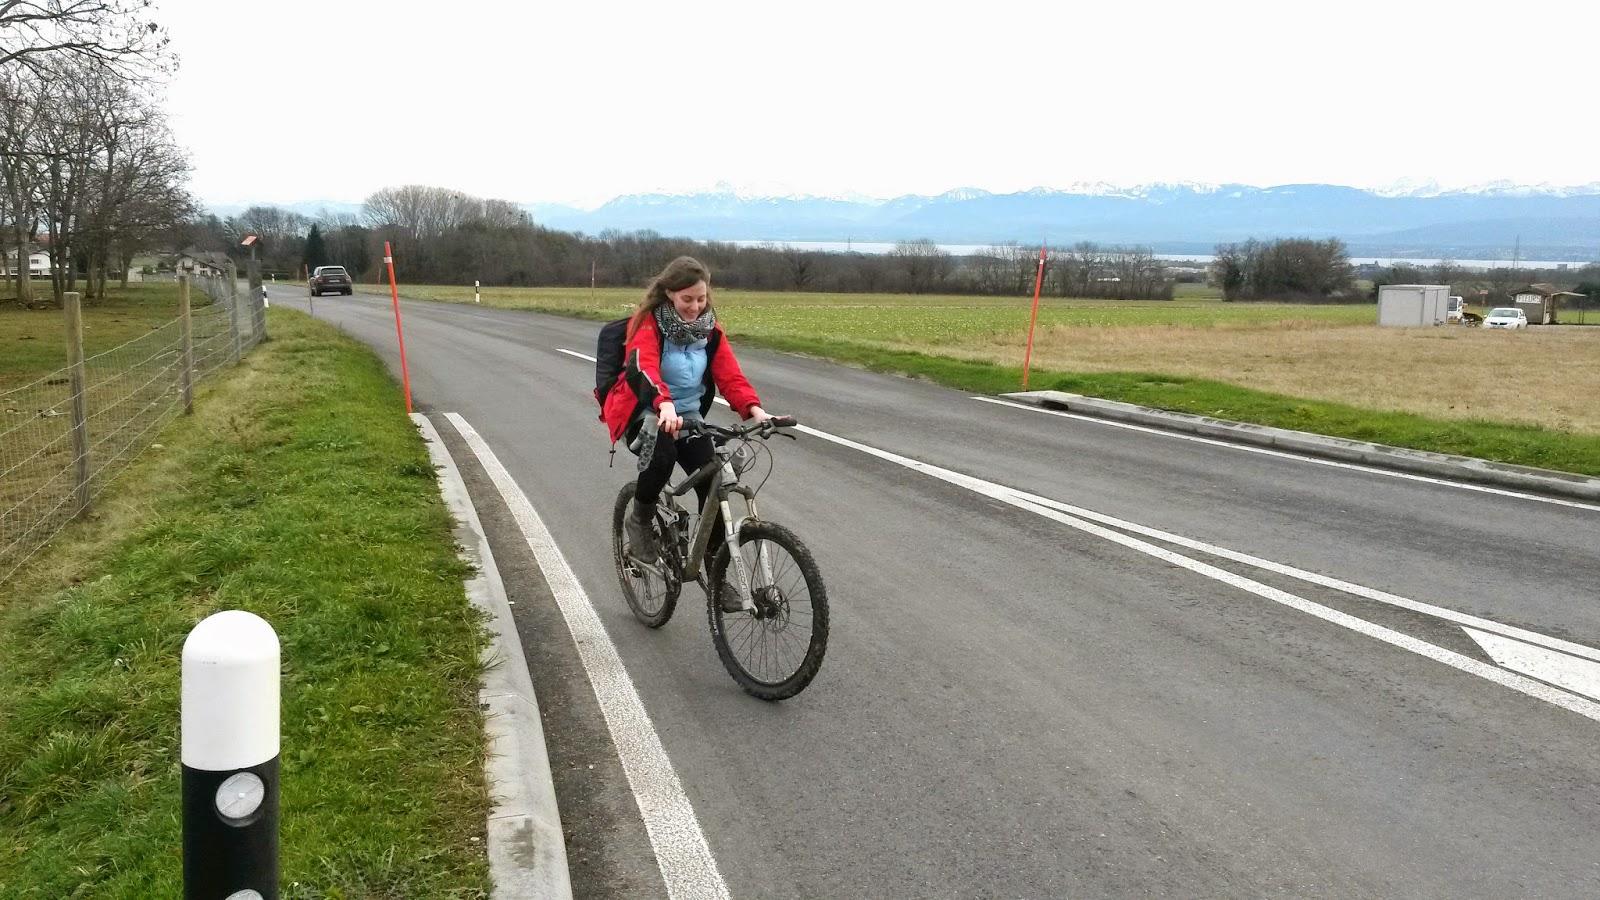 Rebecca Molloy on bike toward forest